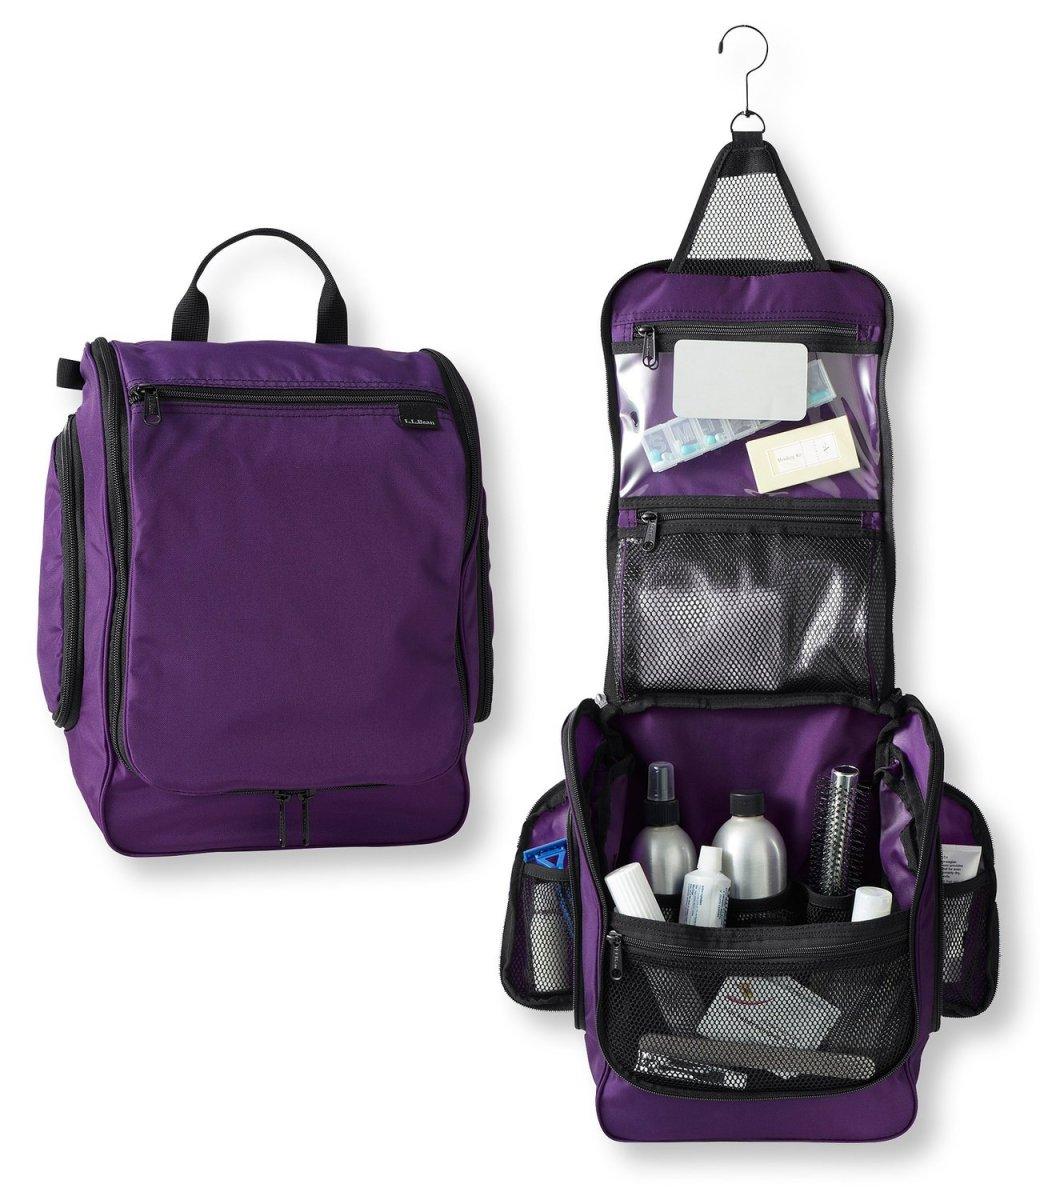 96012cd9b6 REVIEW  LL Bean Small Personal Organizer Toiletry Bag